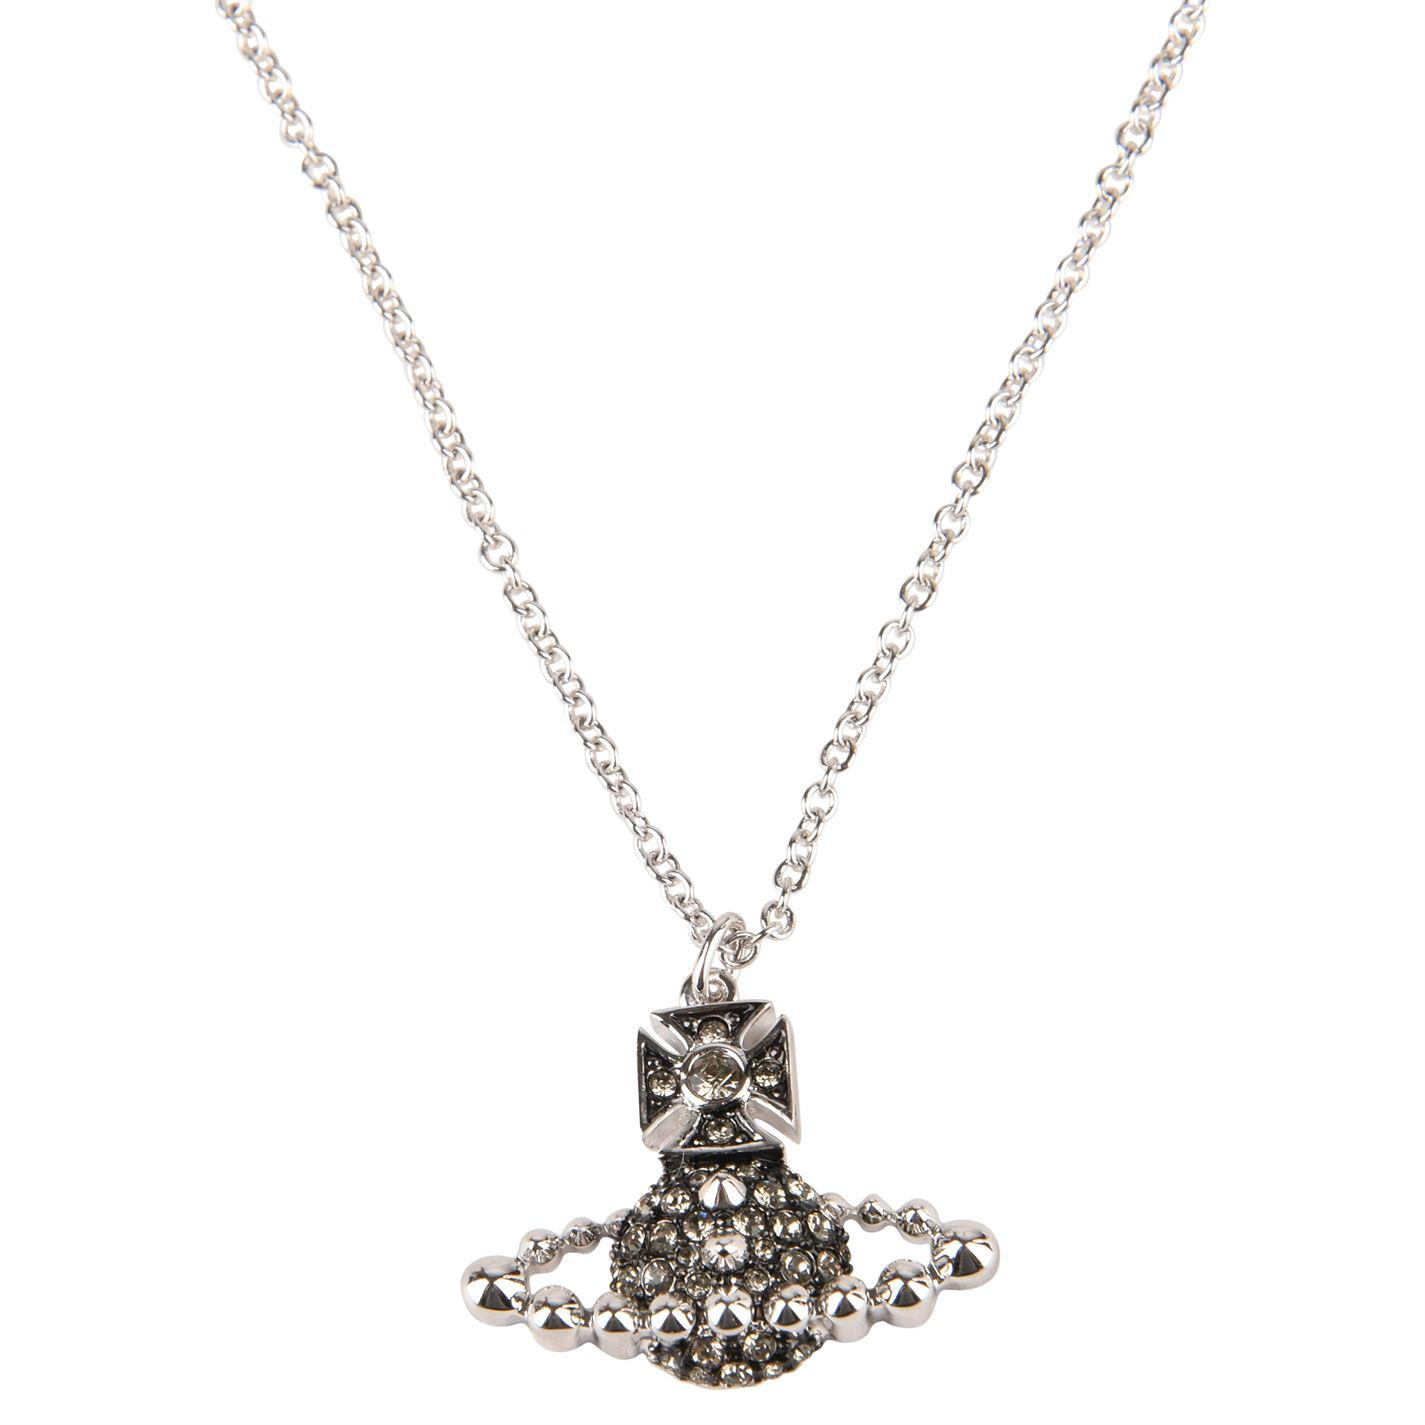 e17eb365a048f Lyst - Vivienne Westwood Lena Pendant Necklace in Metallic